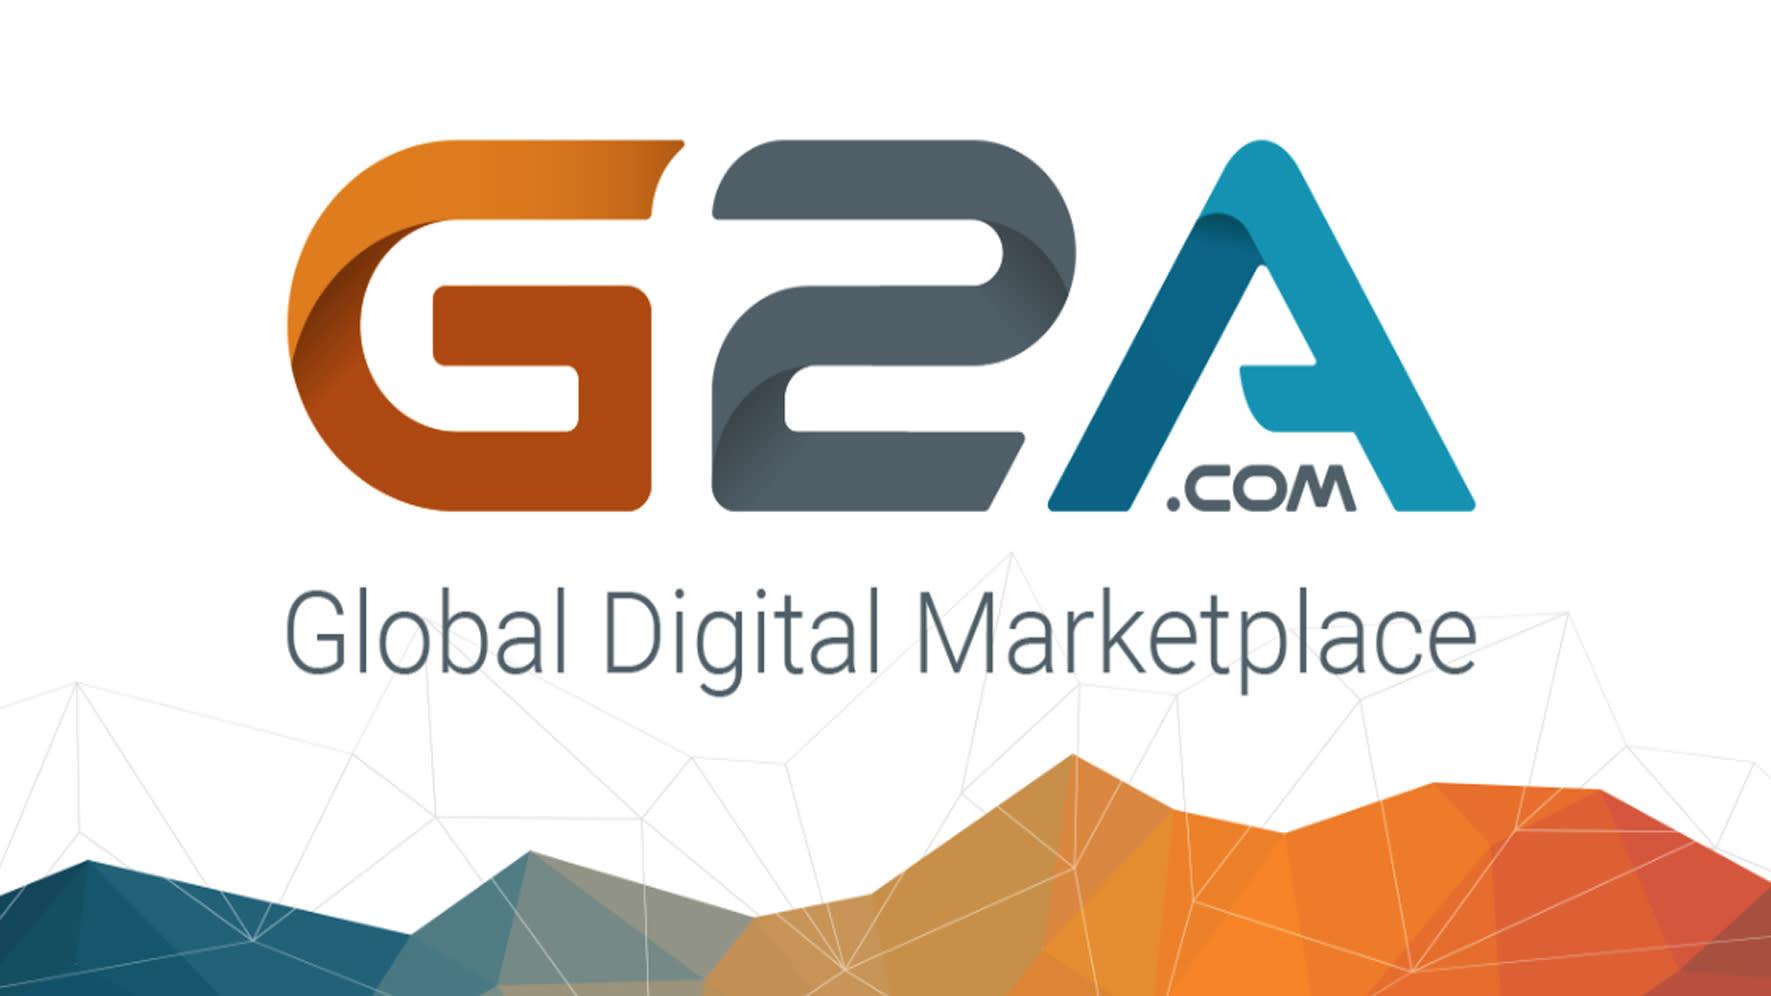 G2A 價格便宜,但暗藏的風險卻不如去下載盜版或是從認證過的數位平台購買。